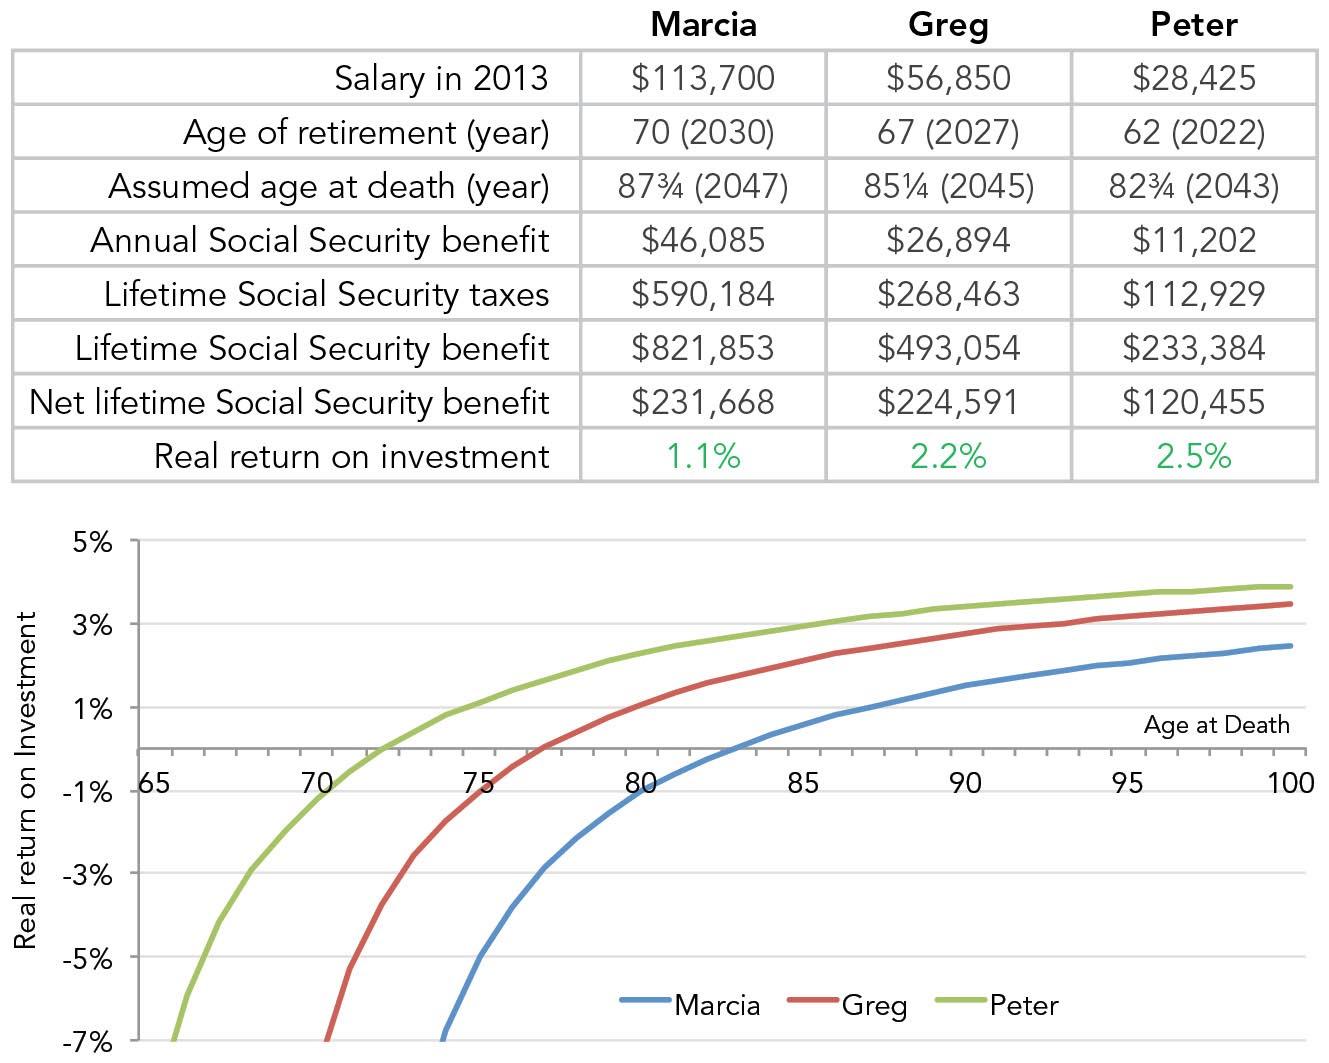 Scenario 4: Employee plus employer, different retirement ages, different life expectancies